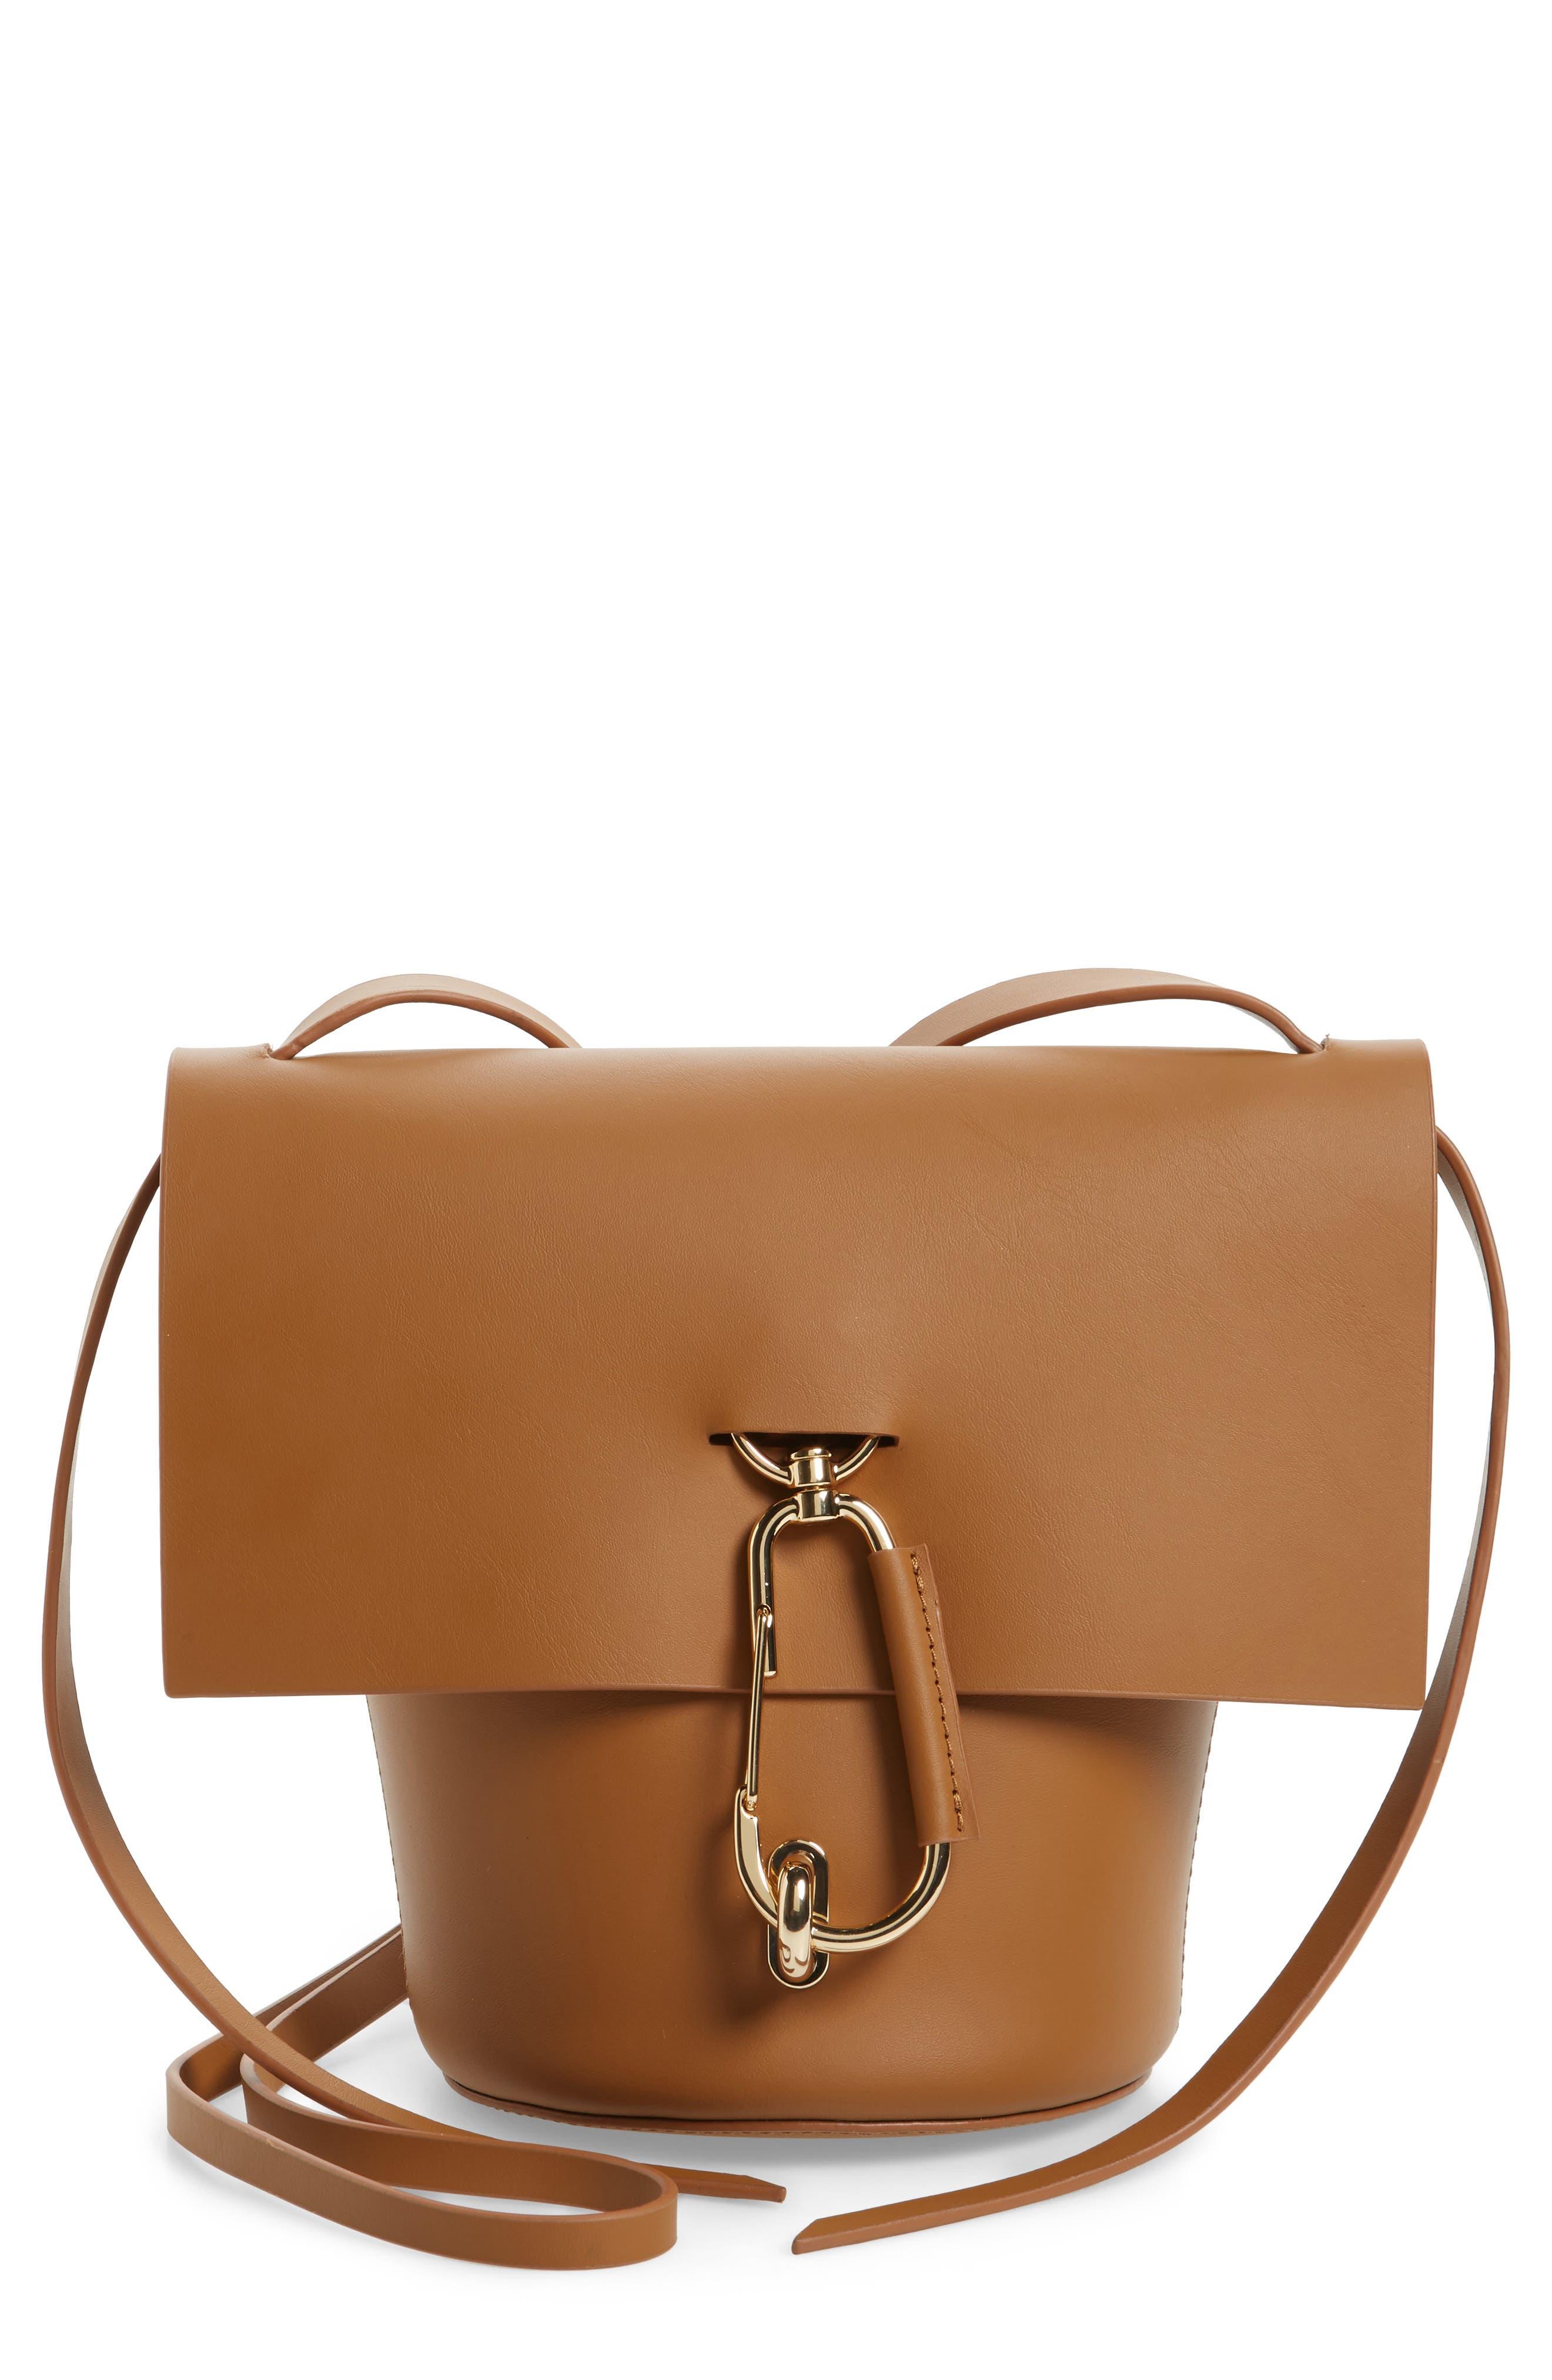 Main Image - ZAC Zac Posen Belay Leather Crossbody Bag